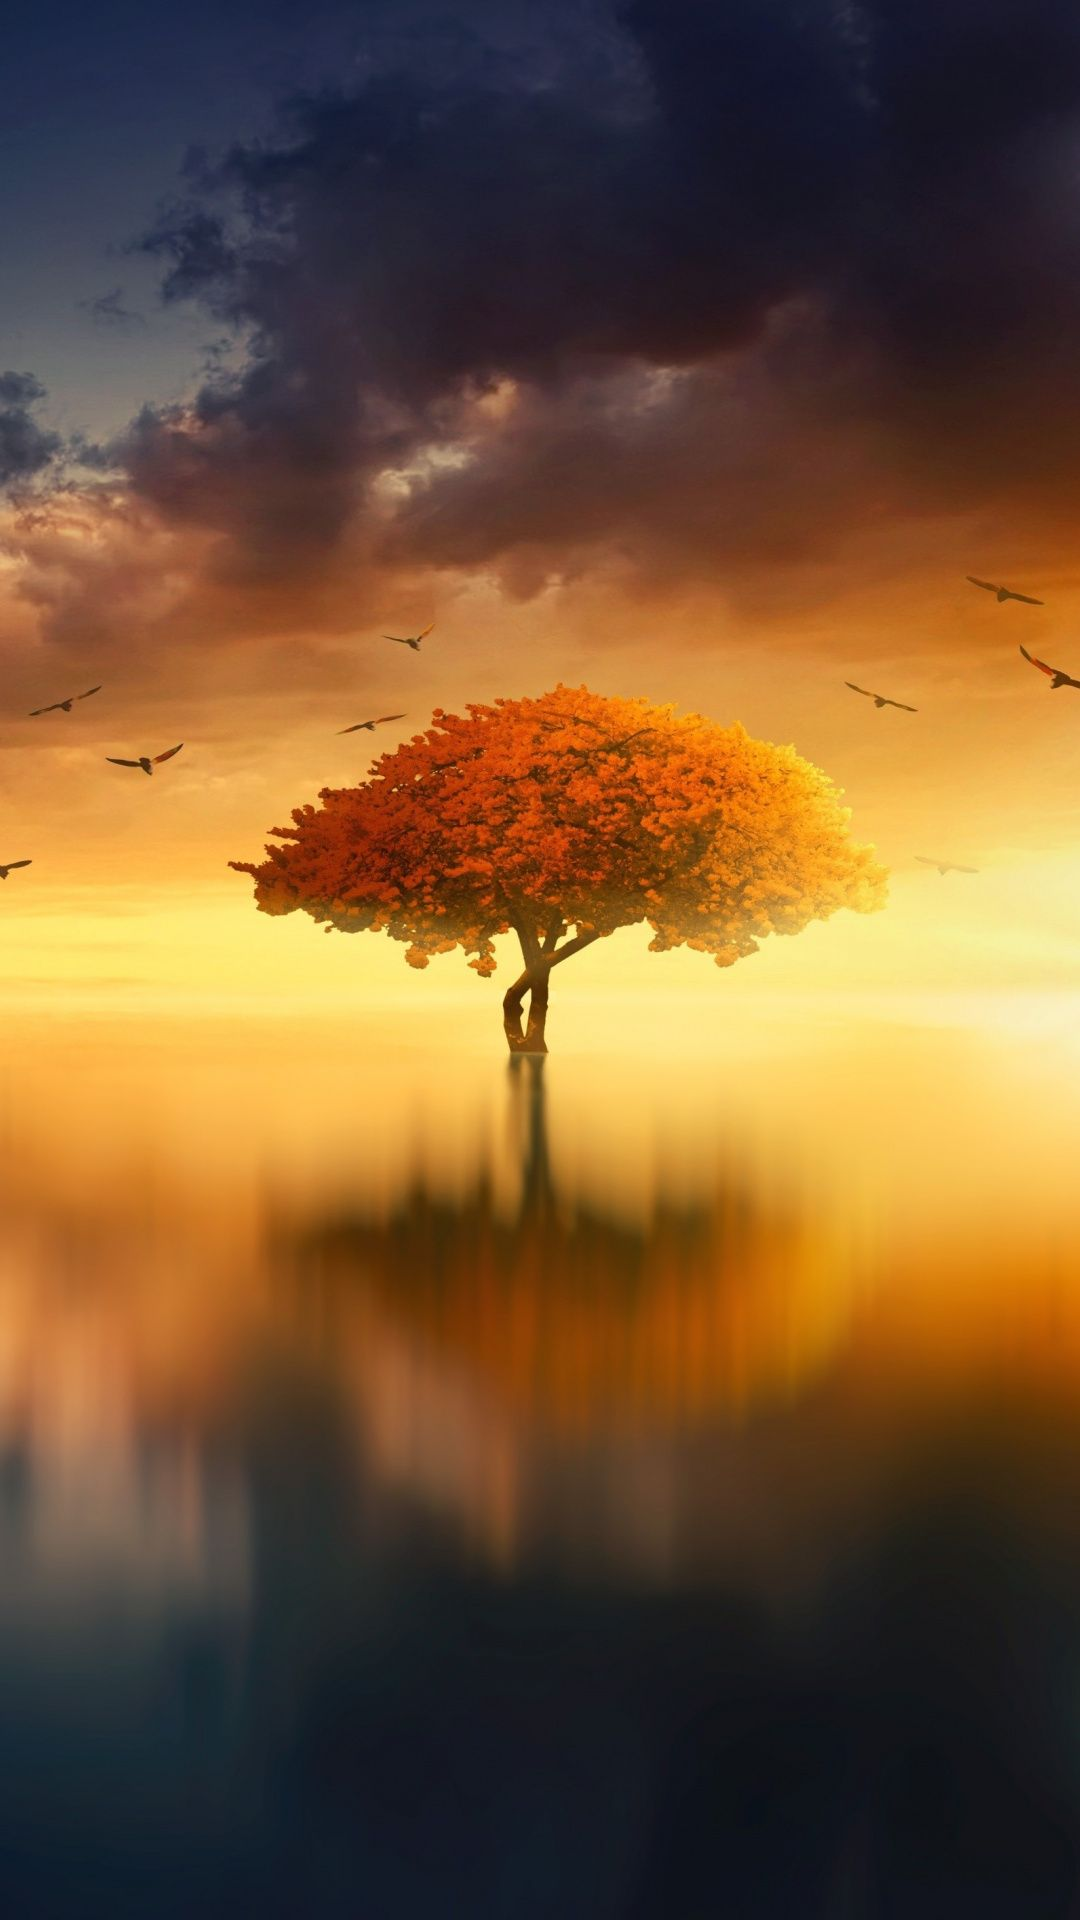 Sunset Birds Lake Tree Reflection Photoshop 1080x1920 Wallpaper Sunset Wallpaper Nature Photography Landscape Photography